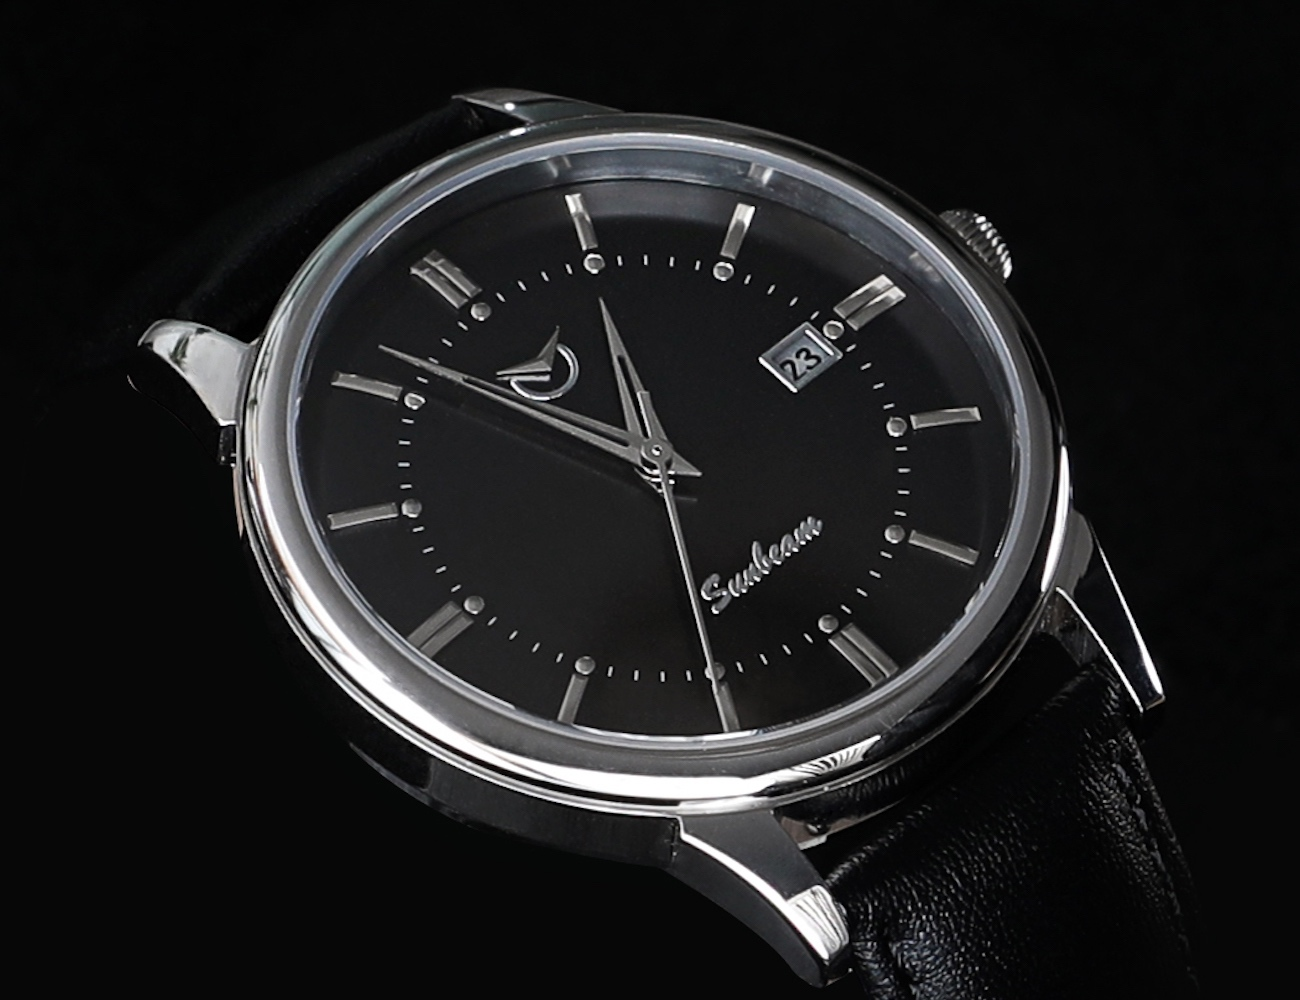 Boomerang Watches Sunbeam Men's Watch Collection